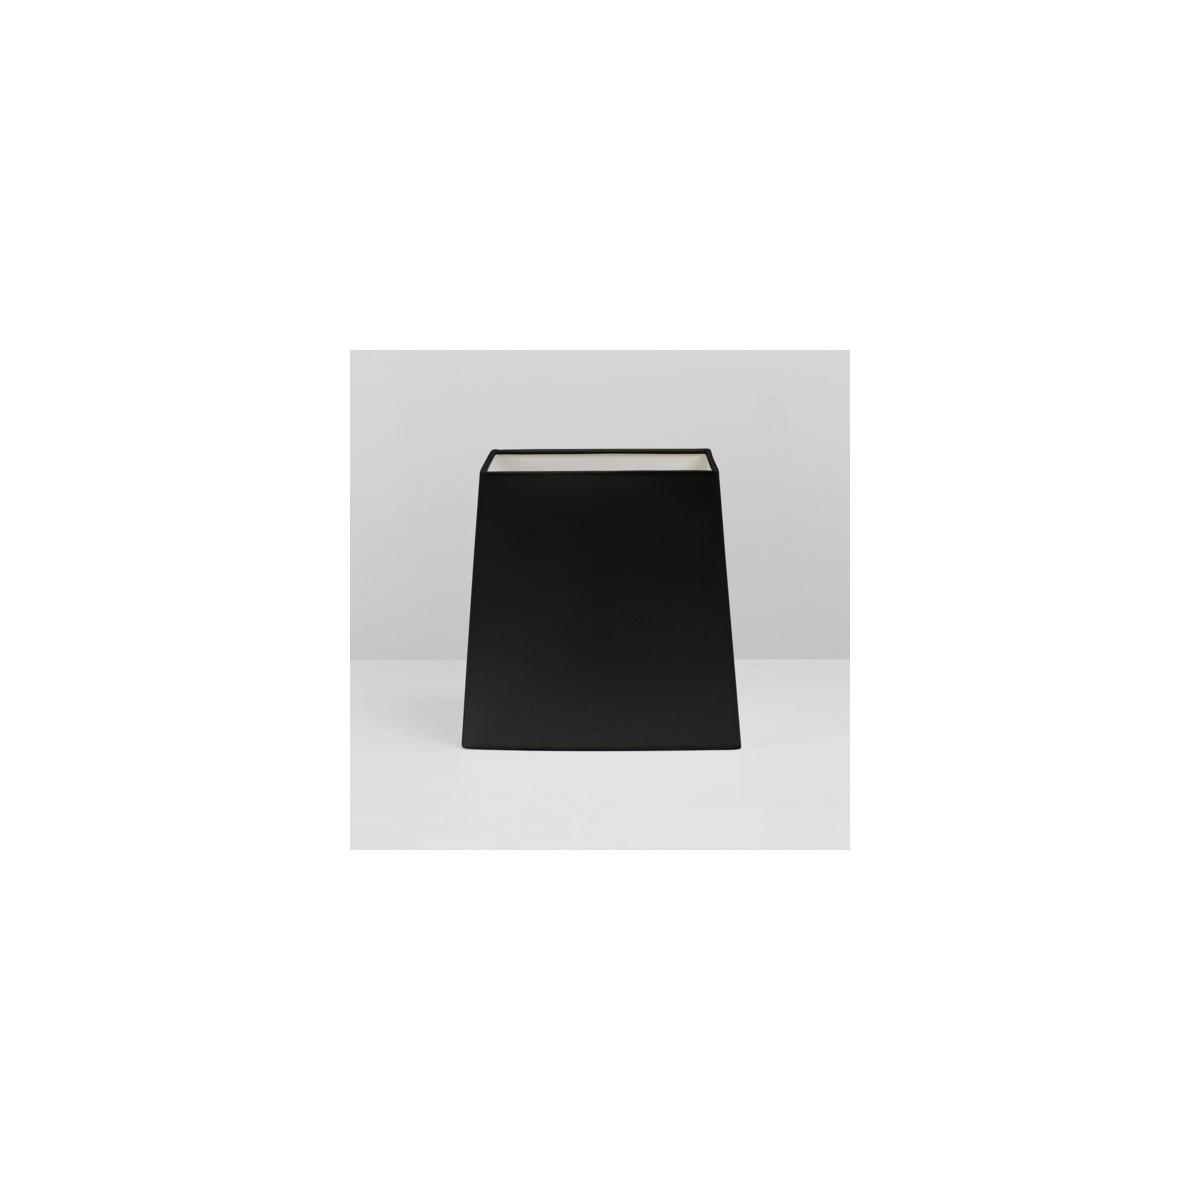 Astro Tapered Square 175 Abażur Czarny 5005002